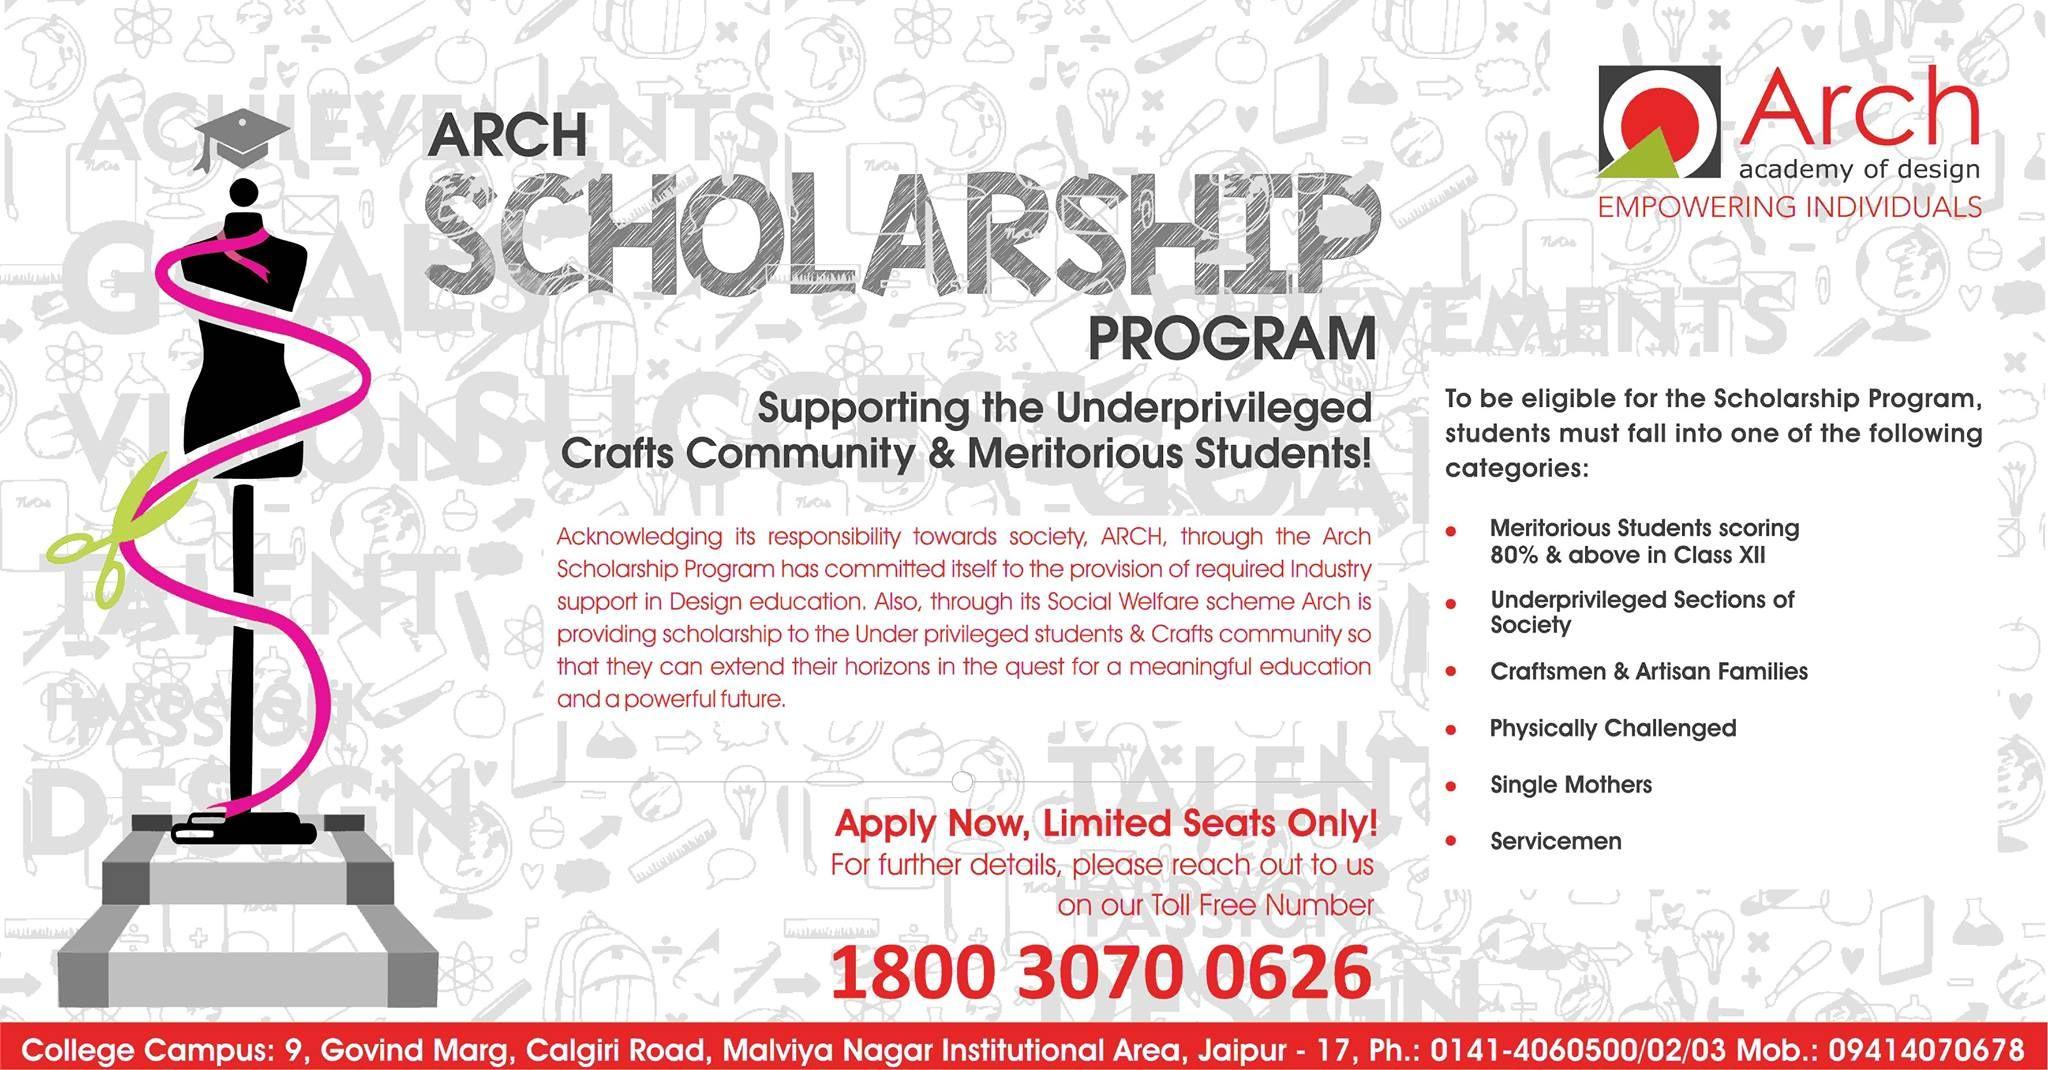 Arch Scholarship Program Http Www Archedu Org College Design Design Management Scholarships